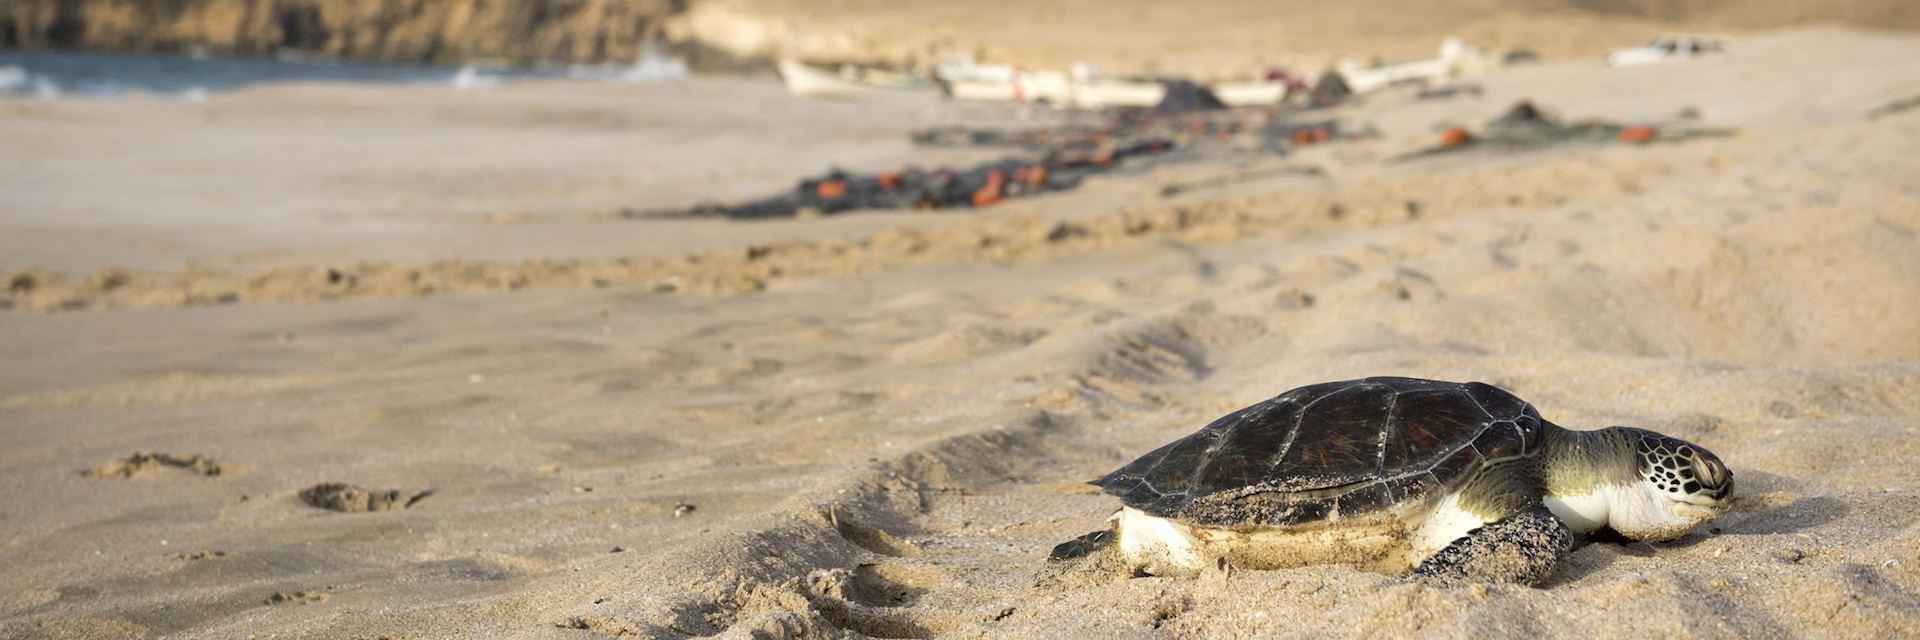 Turtle at Ras Al Jinz Turtle Reserve, Oman